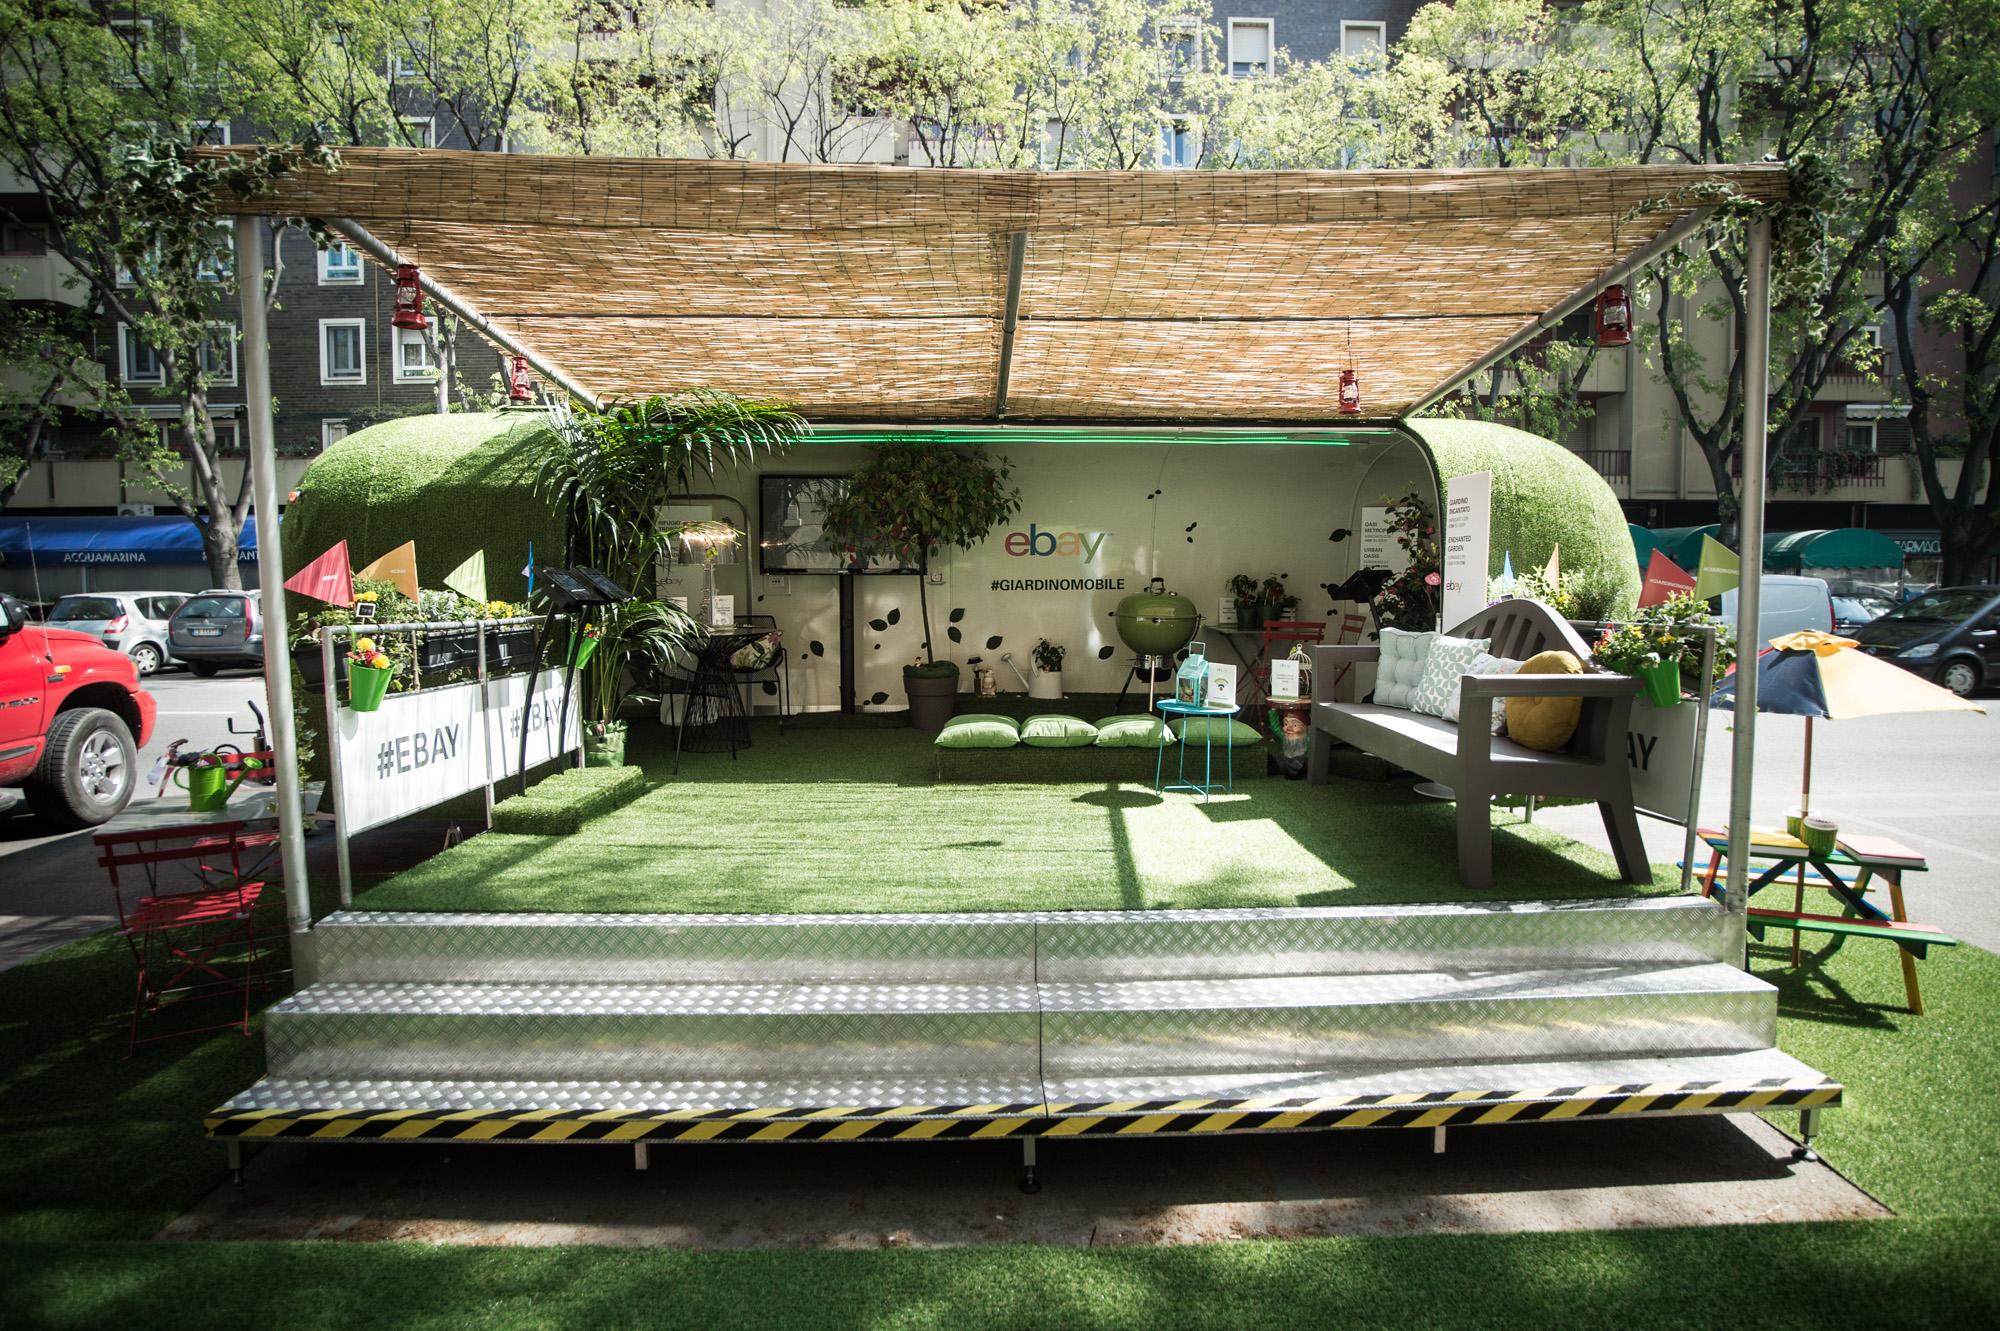 Ebay e il suo 39 giardino mobile 39 for Mobile giardino